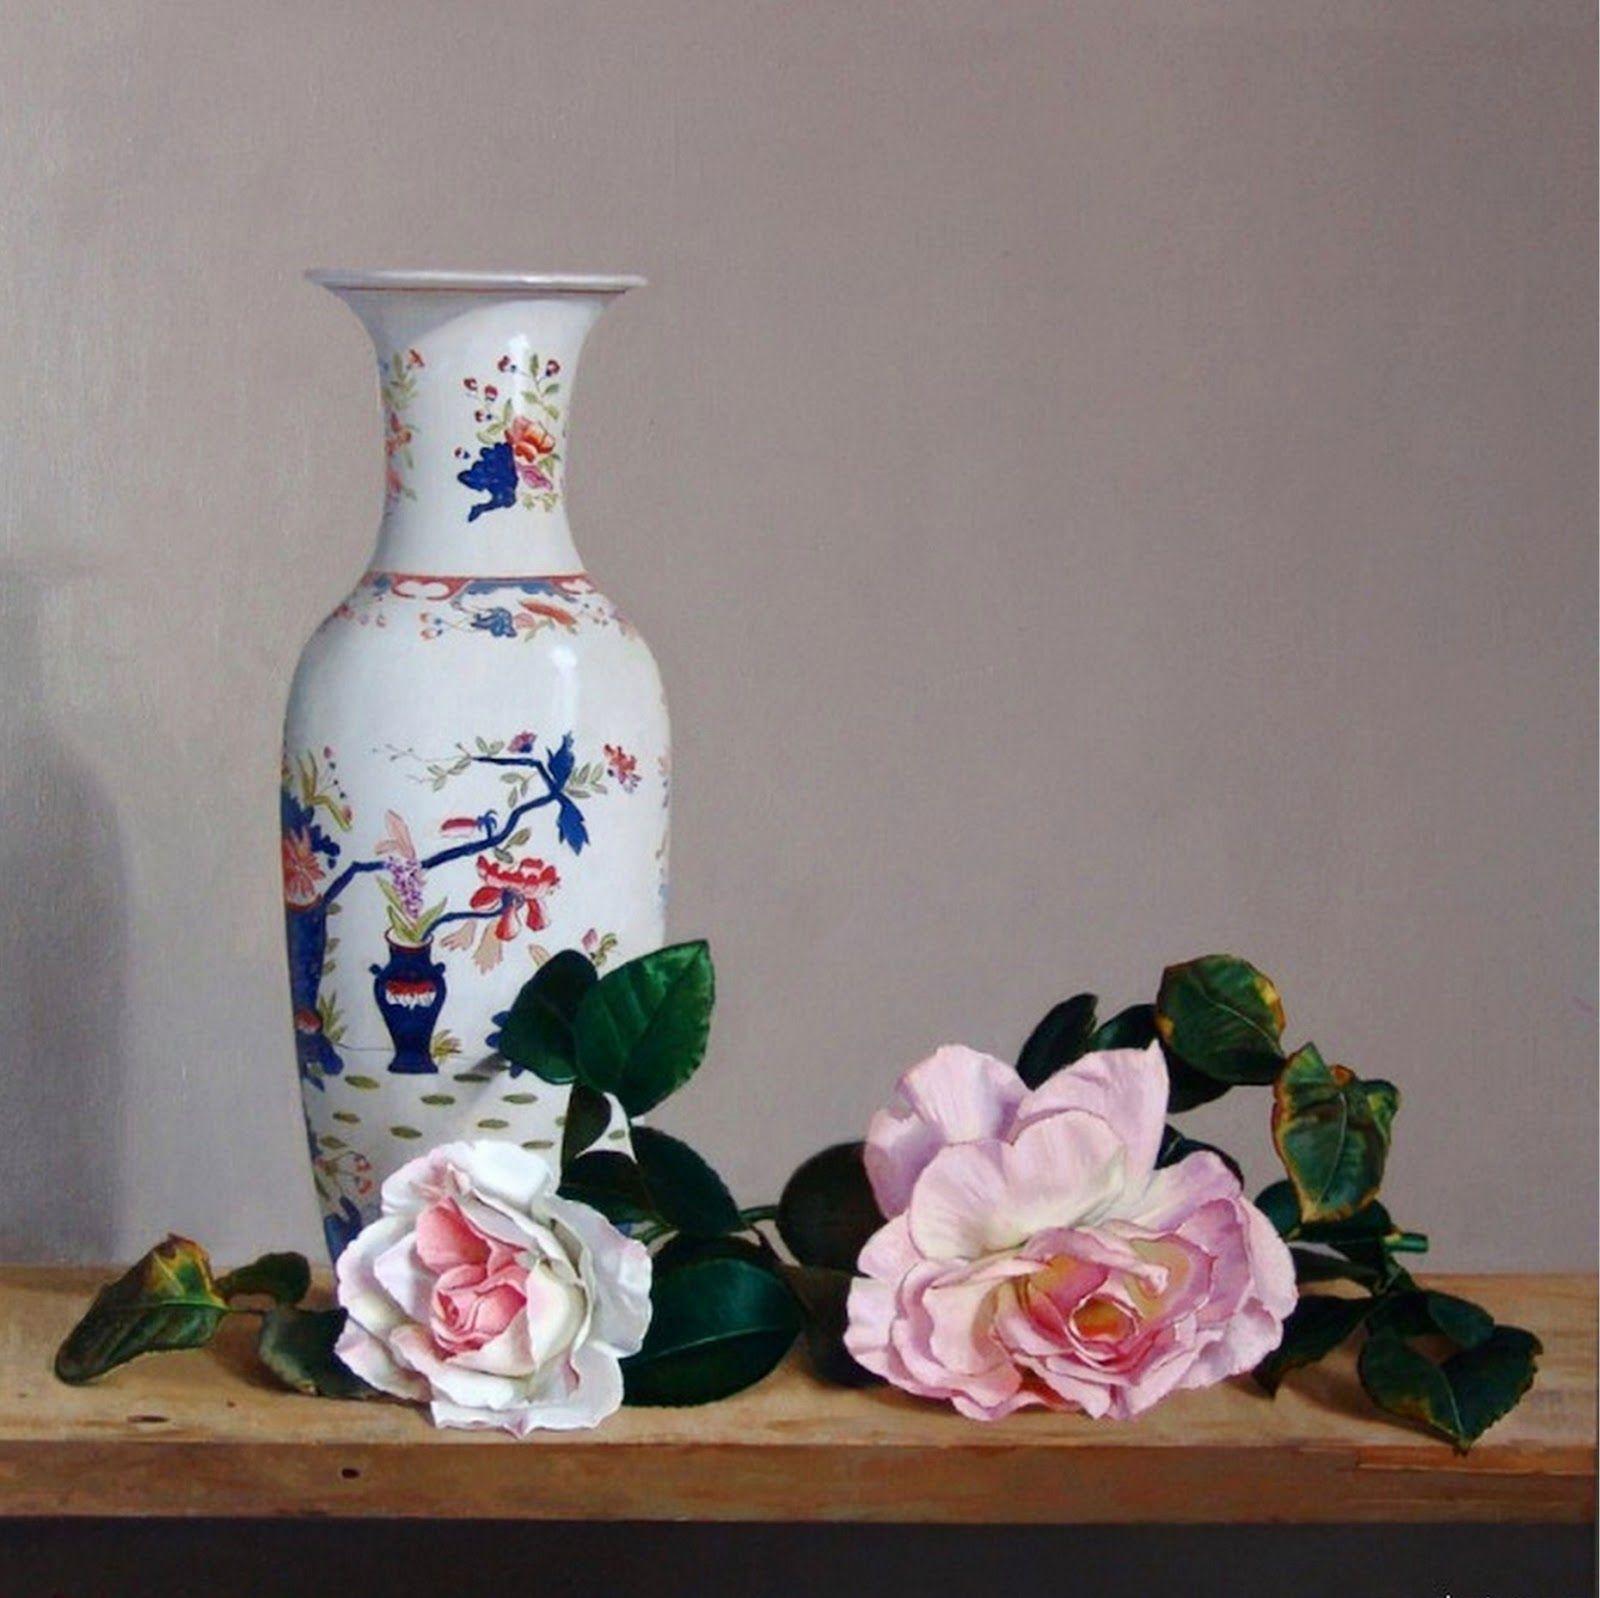 Javier mulio pintura buscar con google holy crap thats paintings reviewsmspy